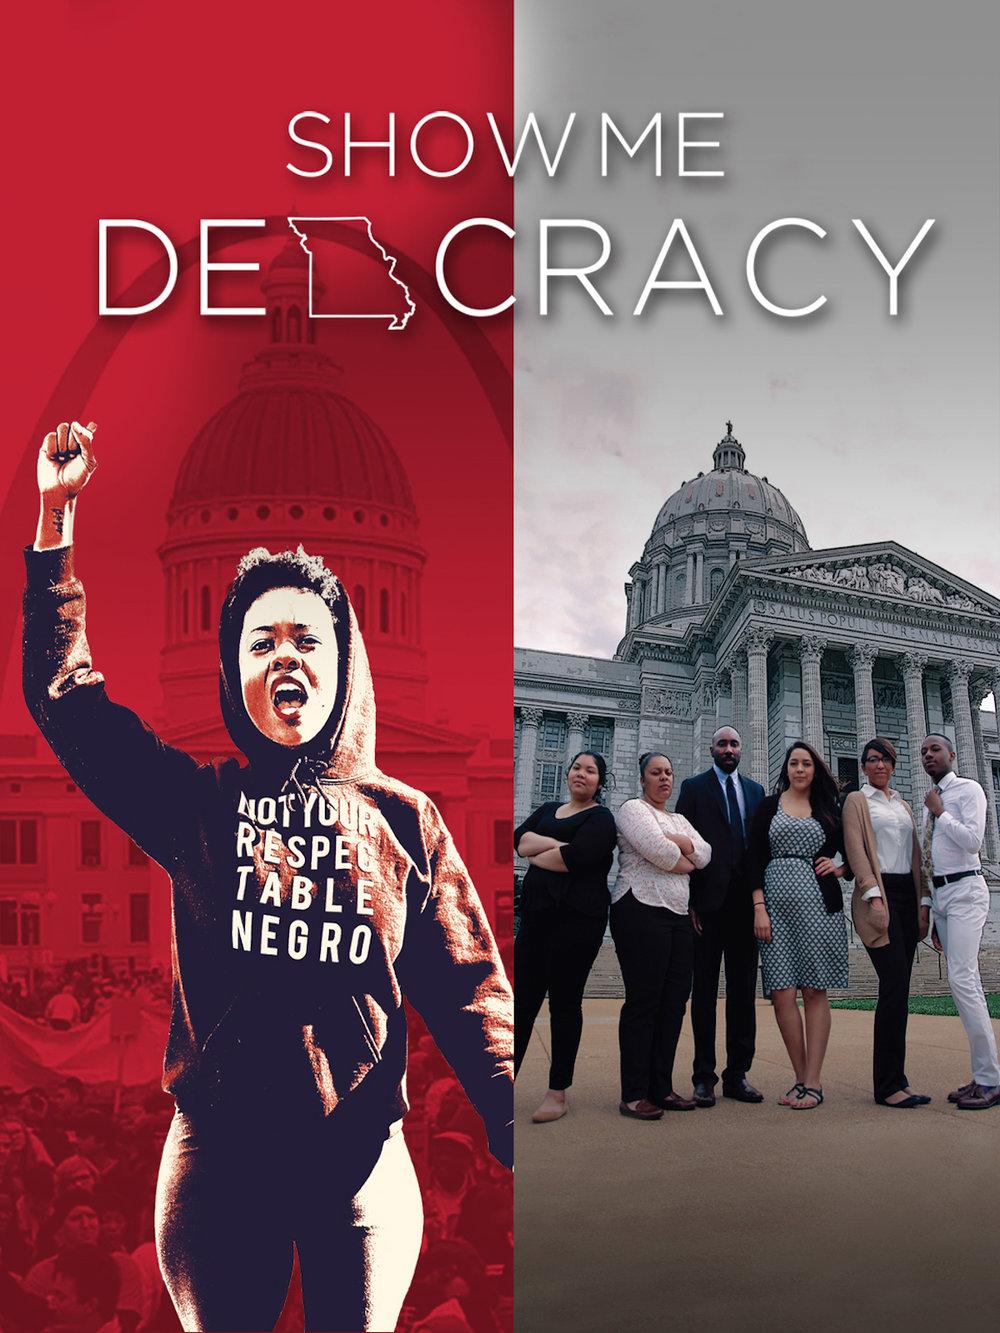 show-me-democracy-final-final-poster.jpg